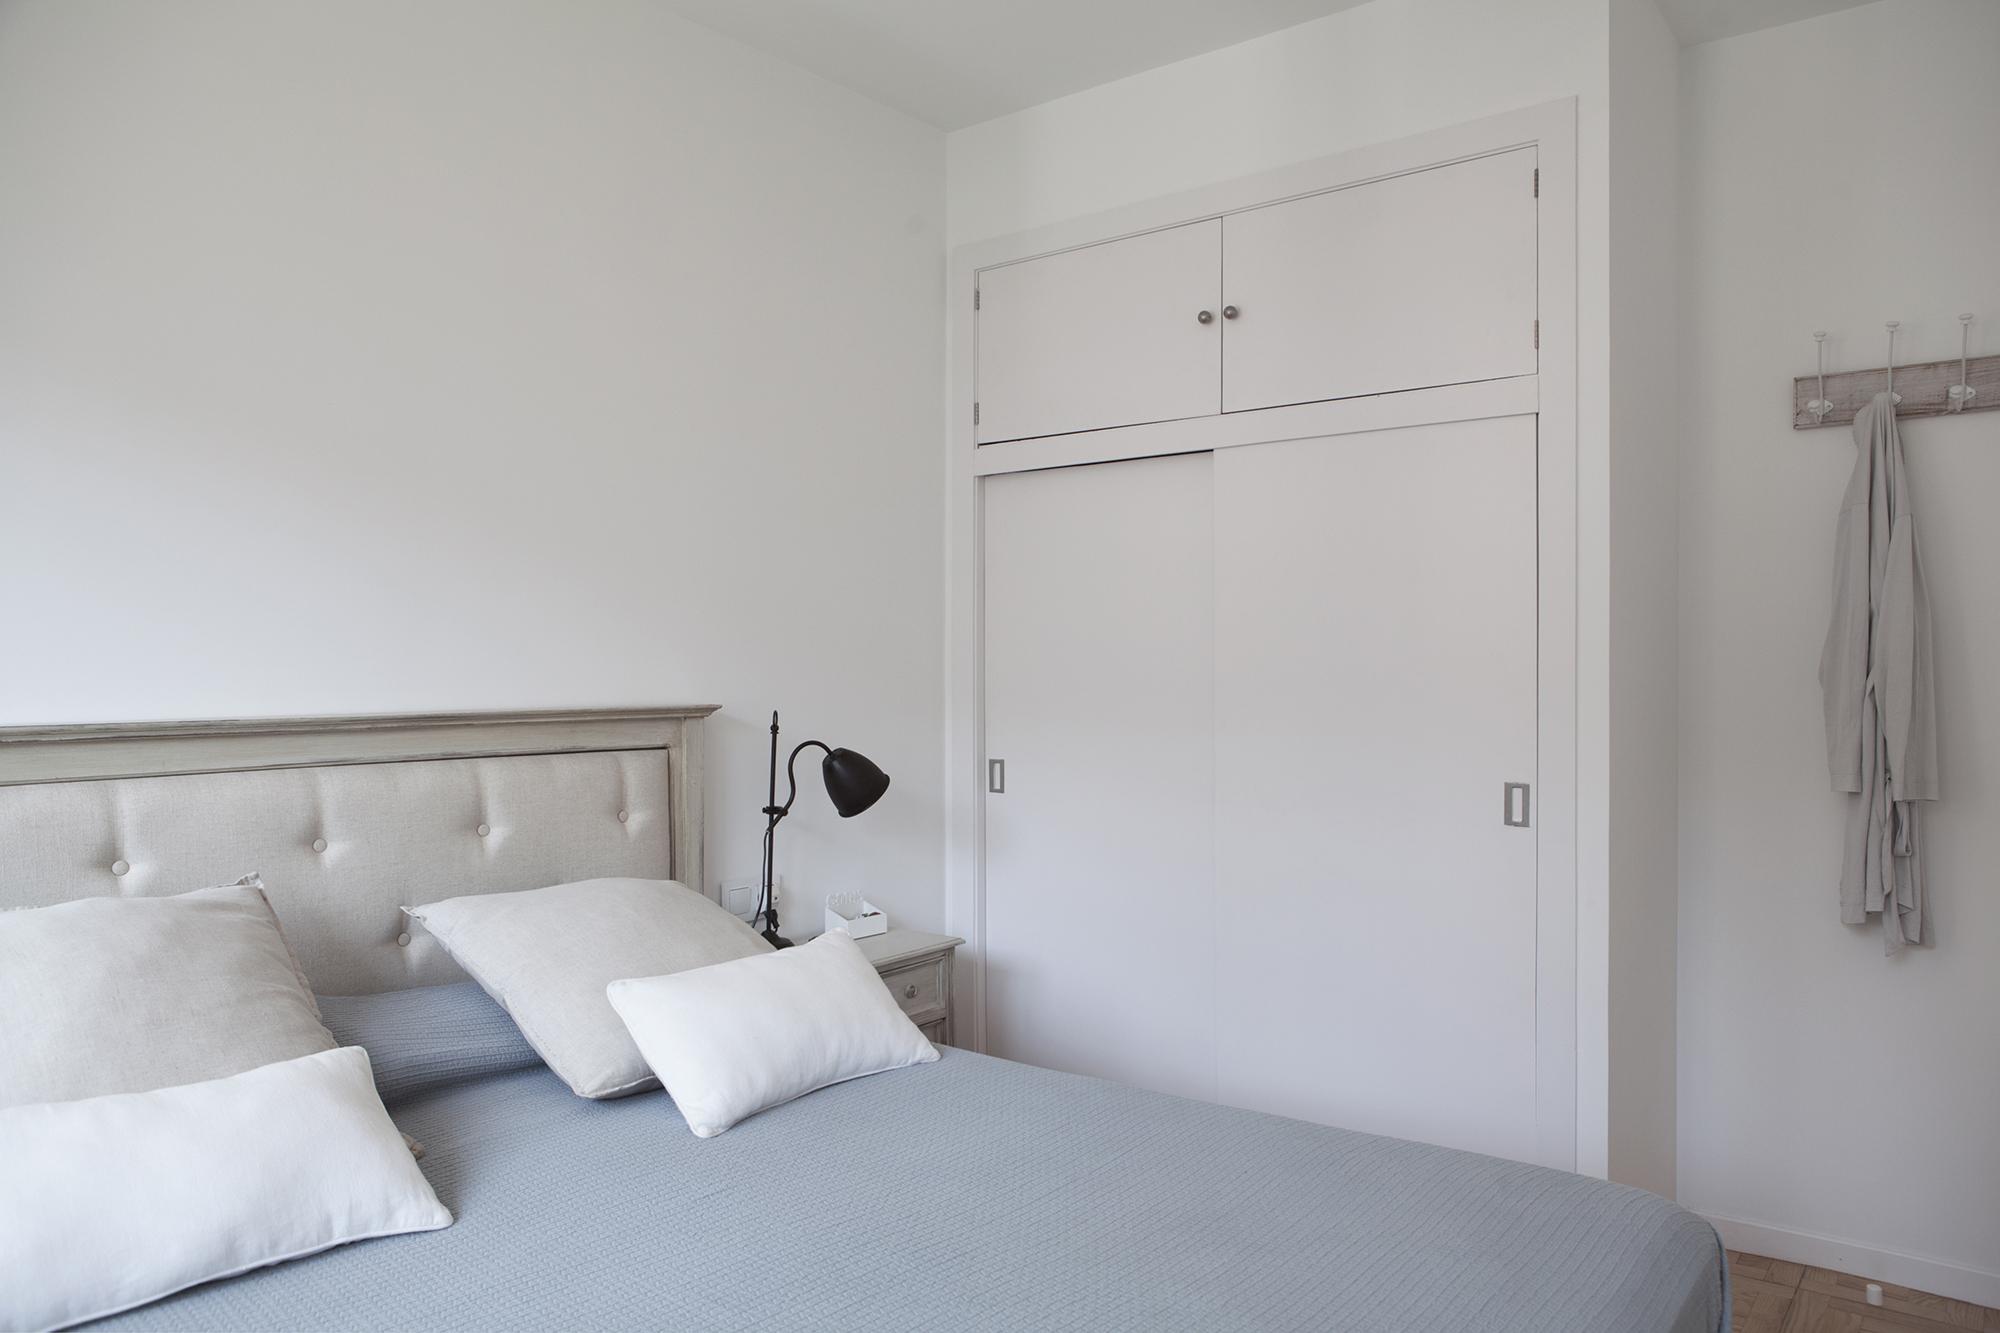 vivienda-Salaberria-Donostia-2016-12